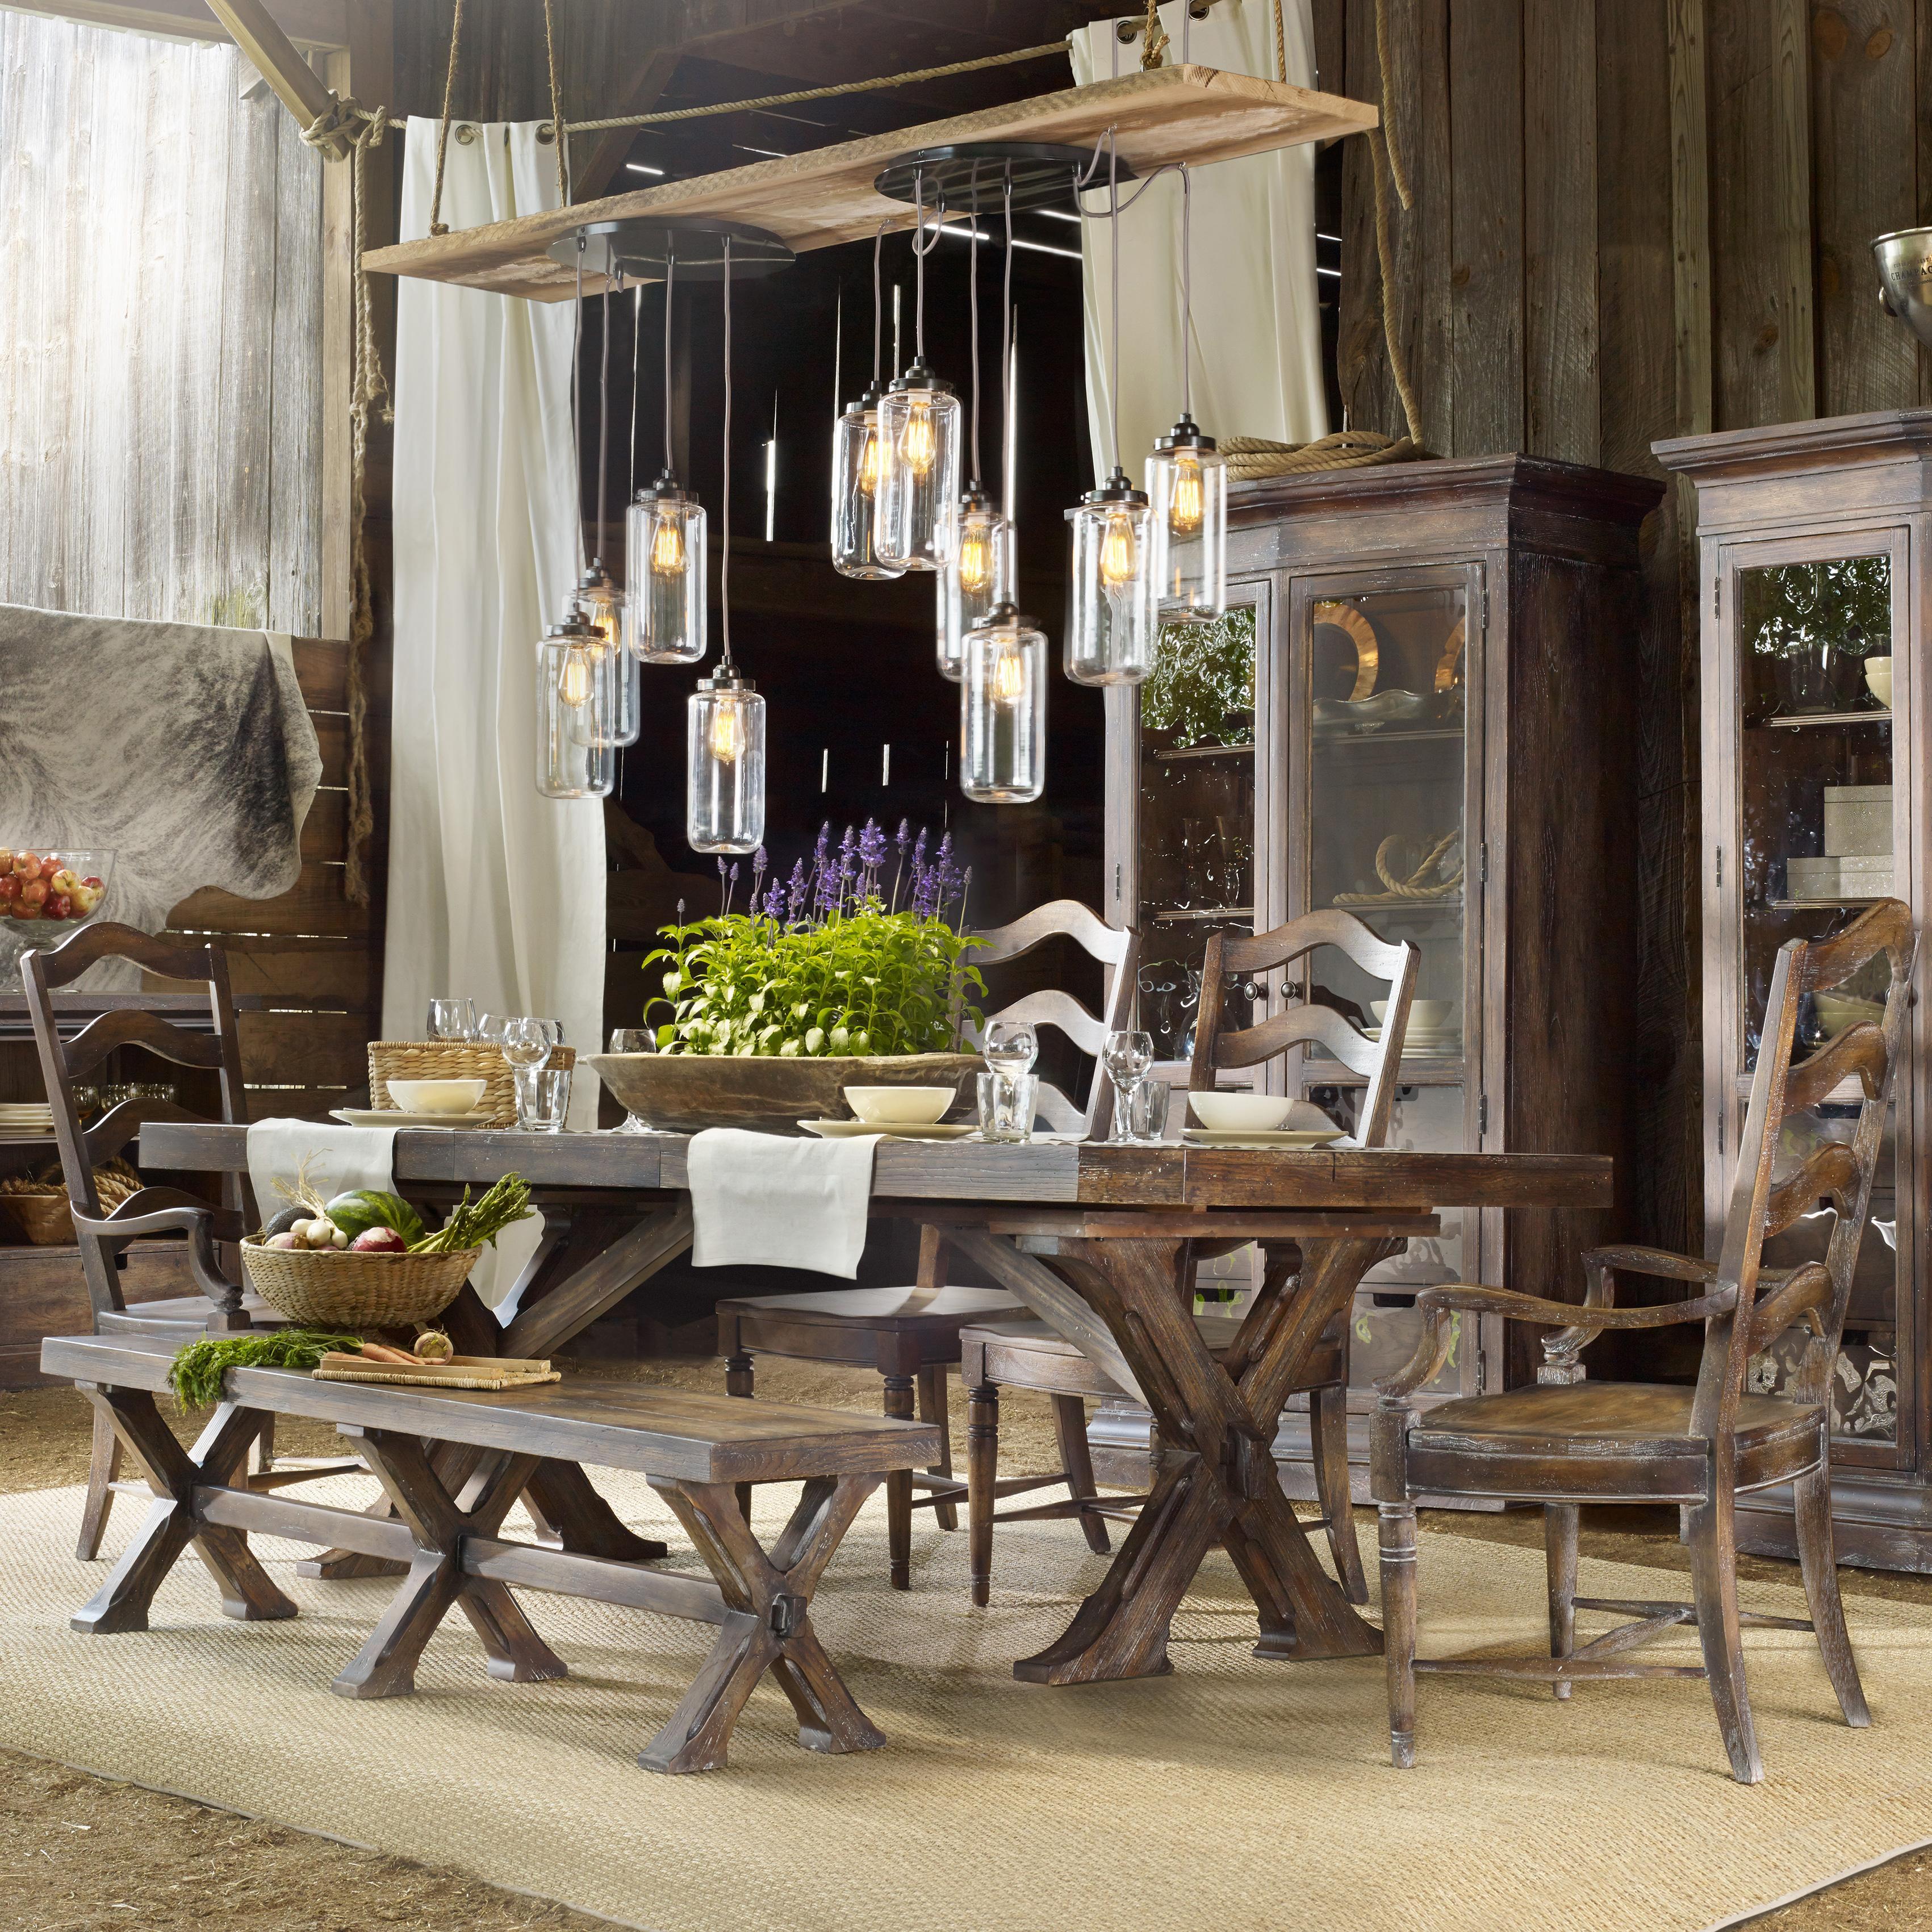 Hooker Furniture Willow Bend 6 Piece Dining Set - Item Number: 5343-75200+2x300+2x310+315